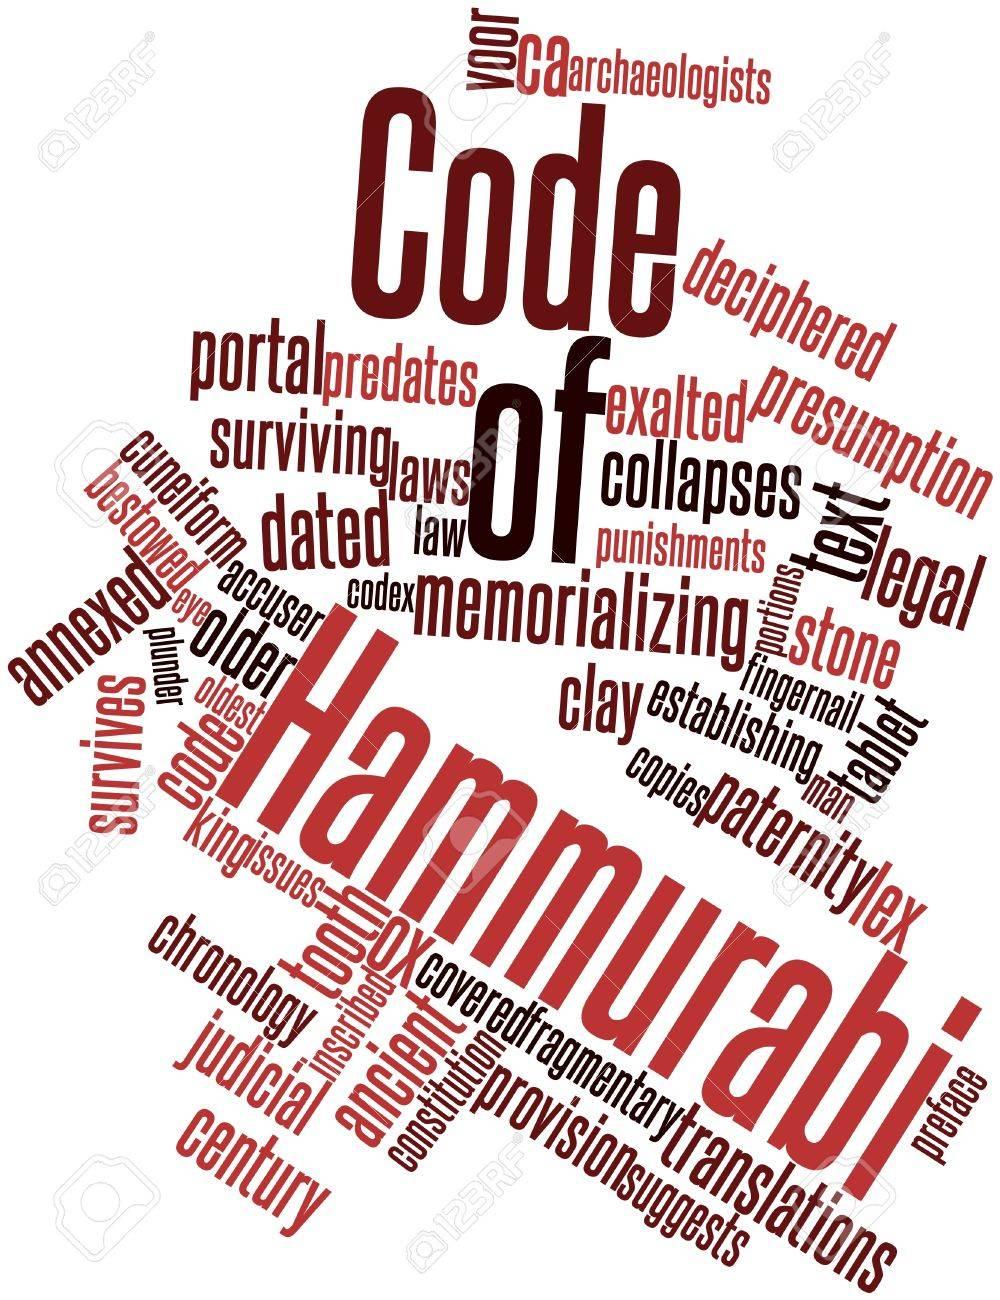 How do i cite the code of hammurabi?